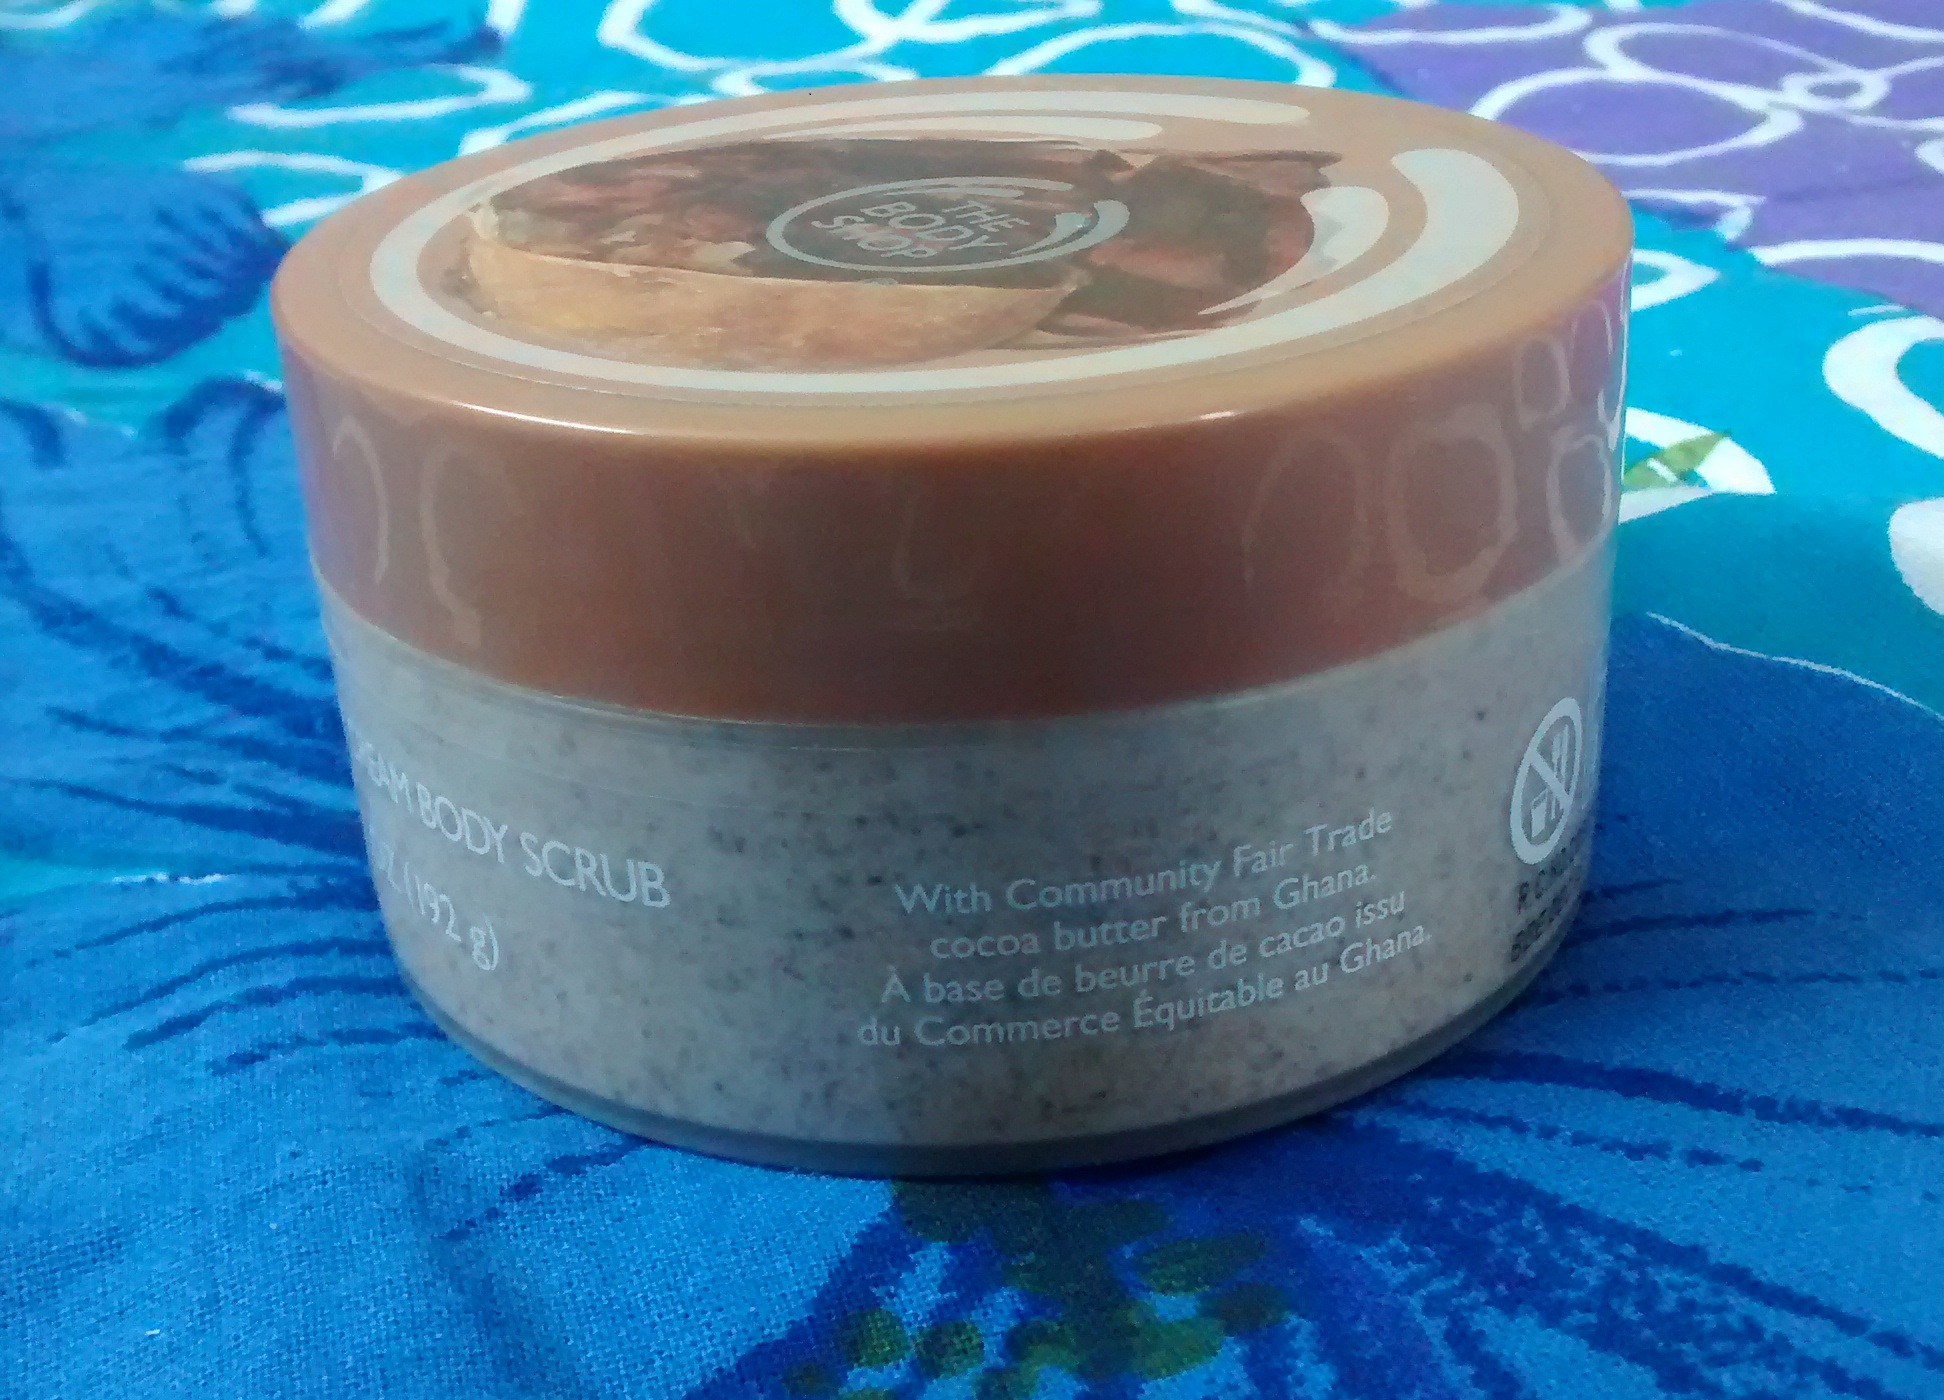 body shop cocoa butter body scrub review